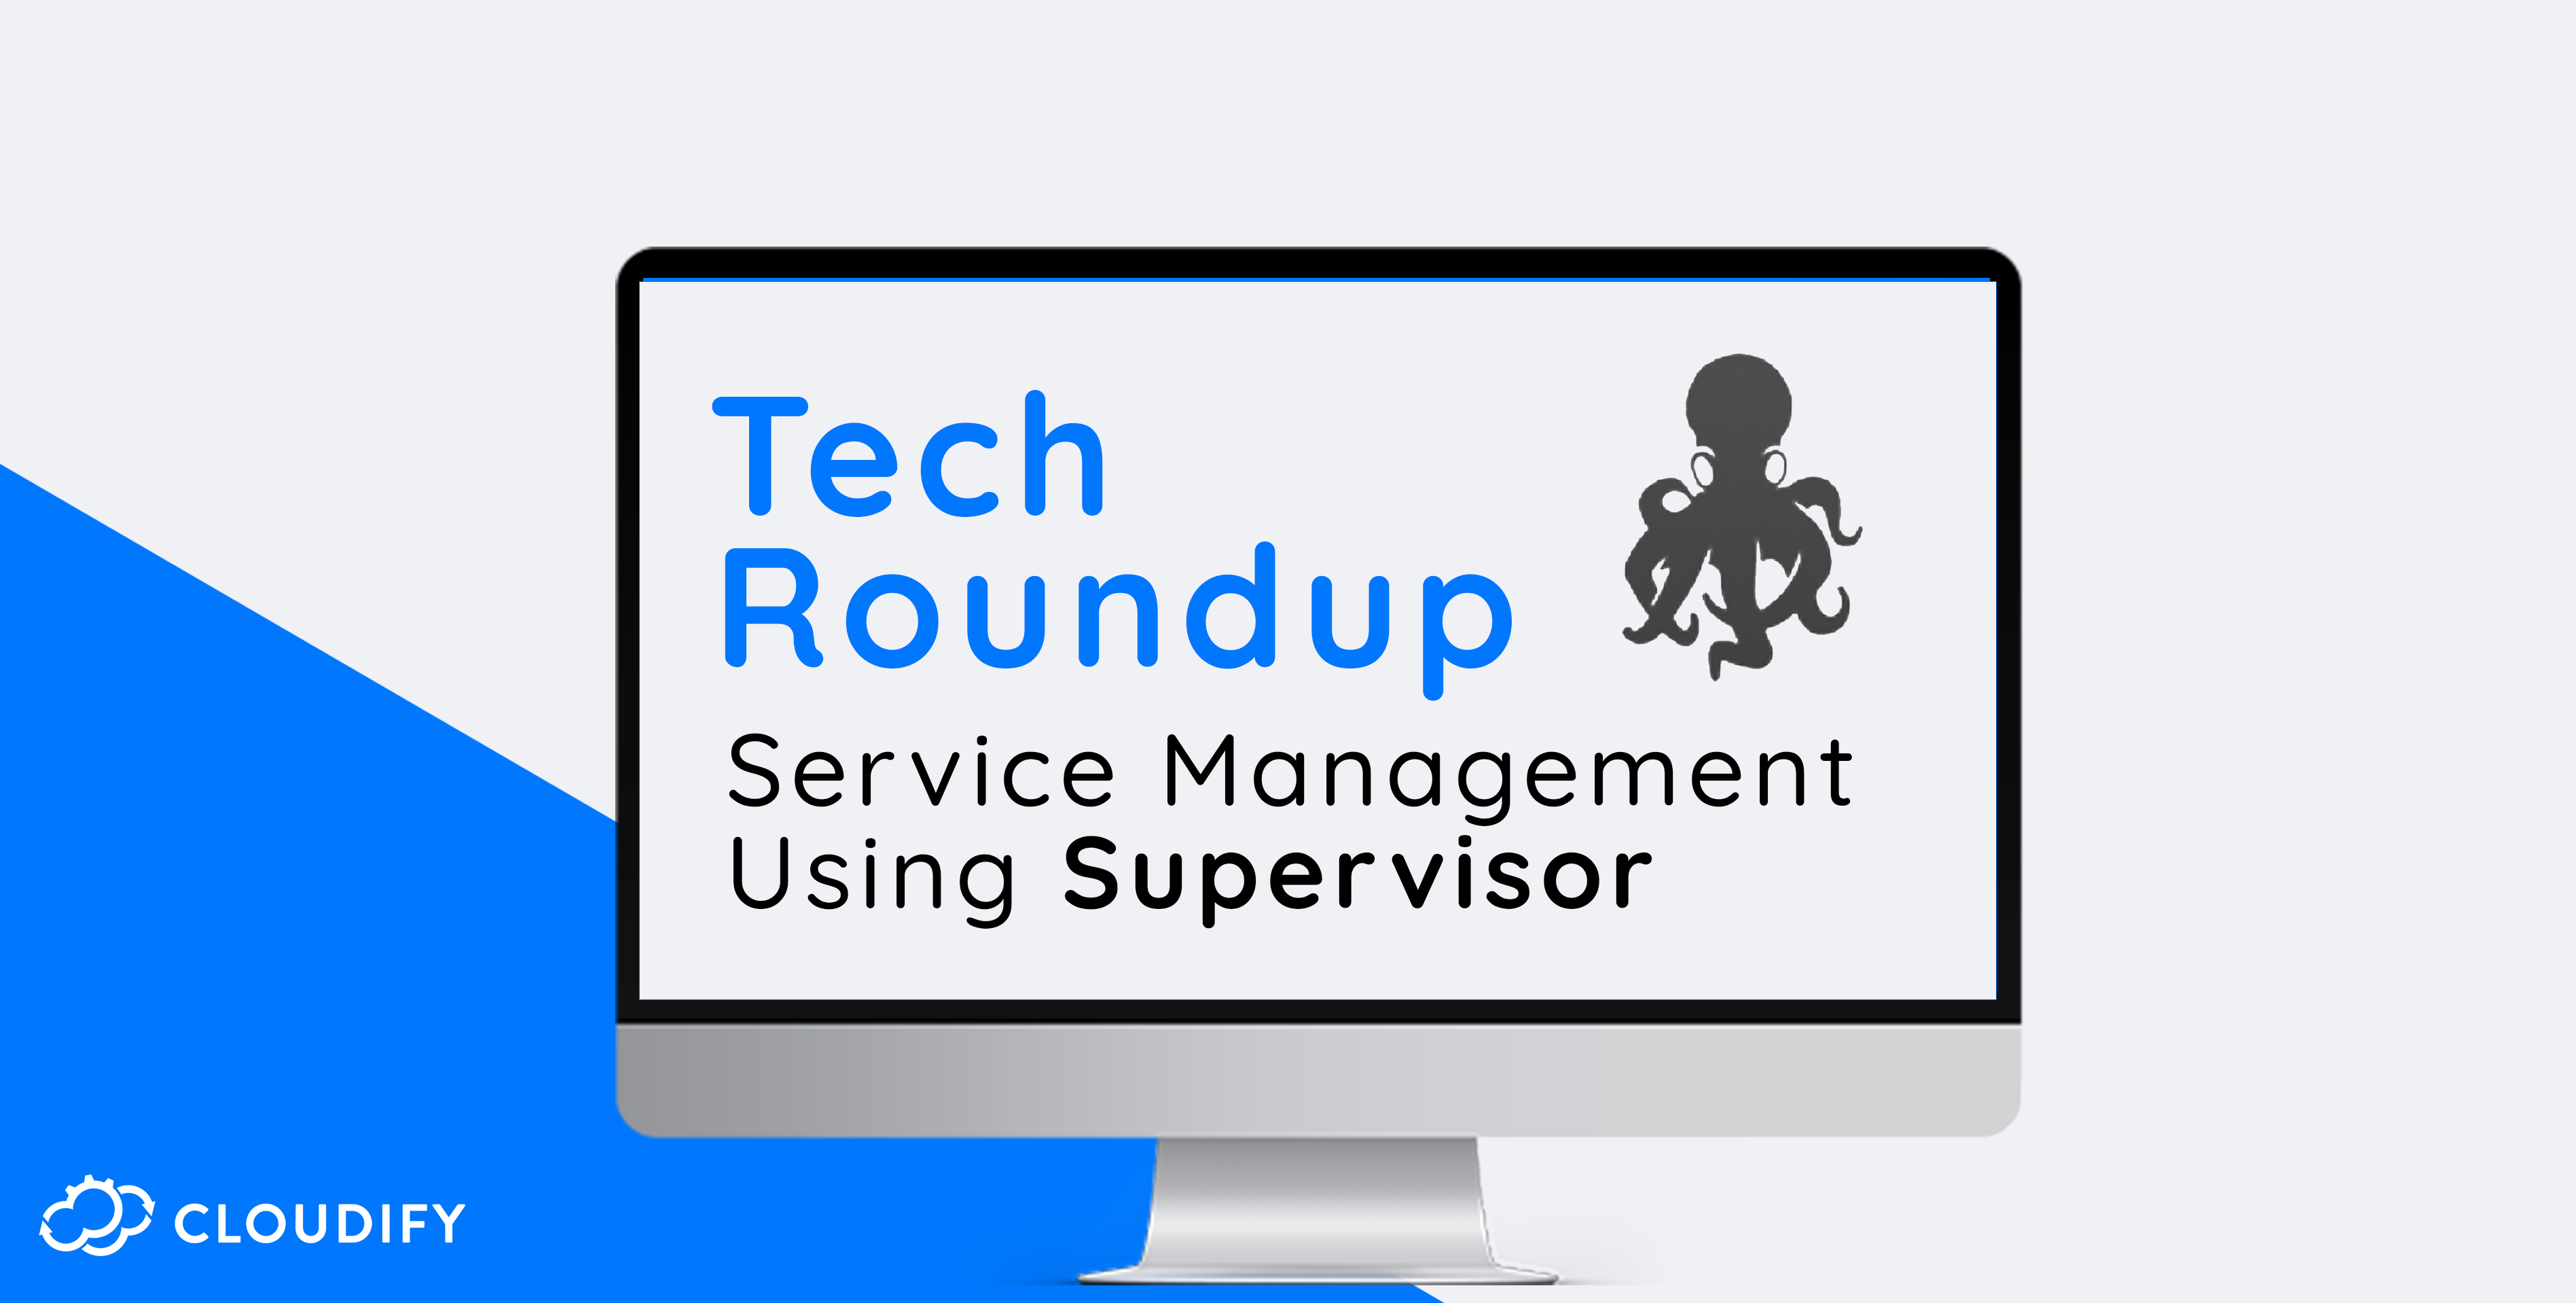 Service management using Supervisor, cloud native